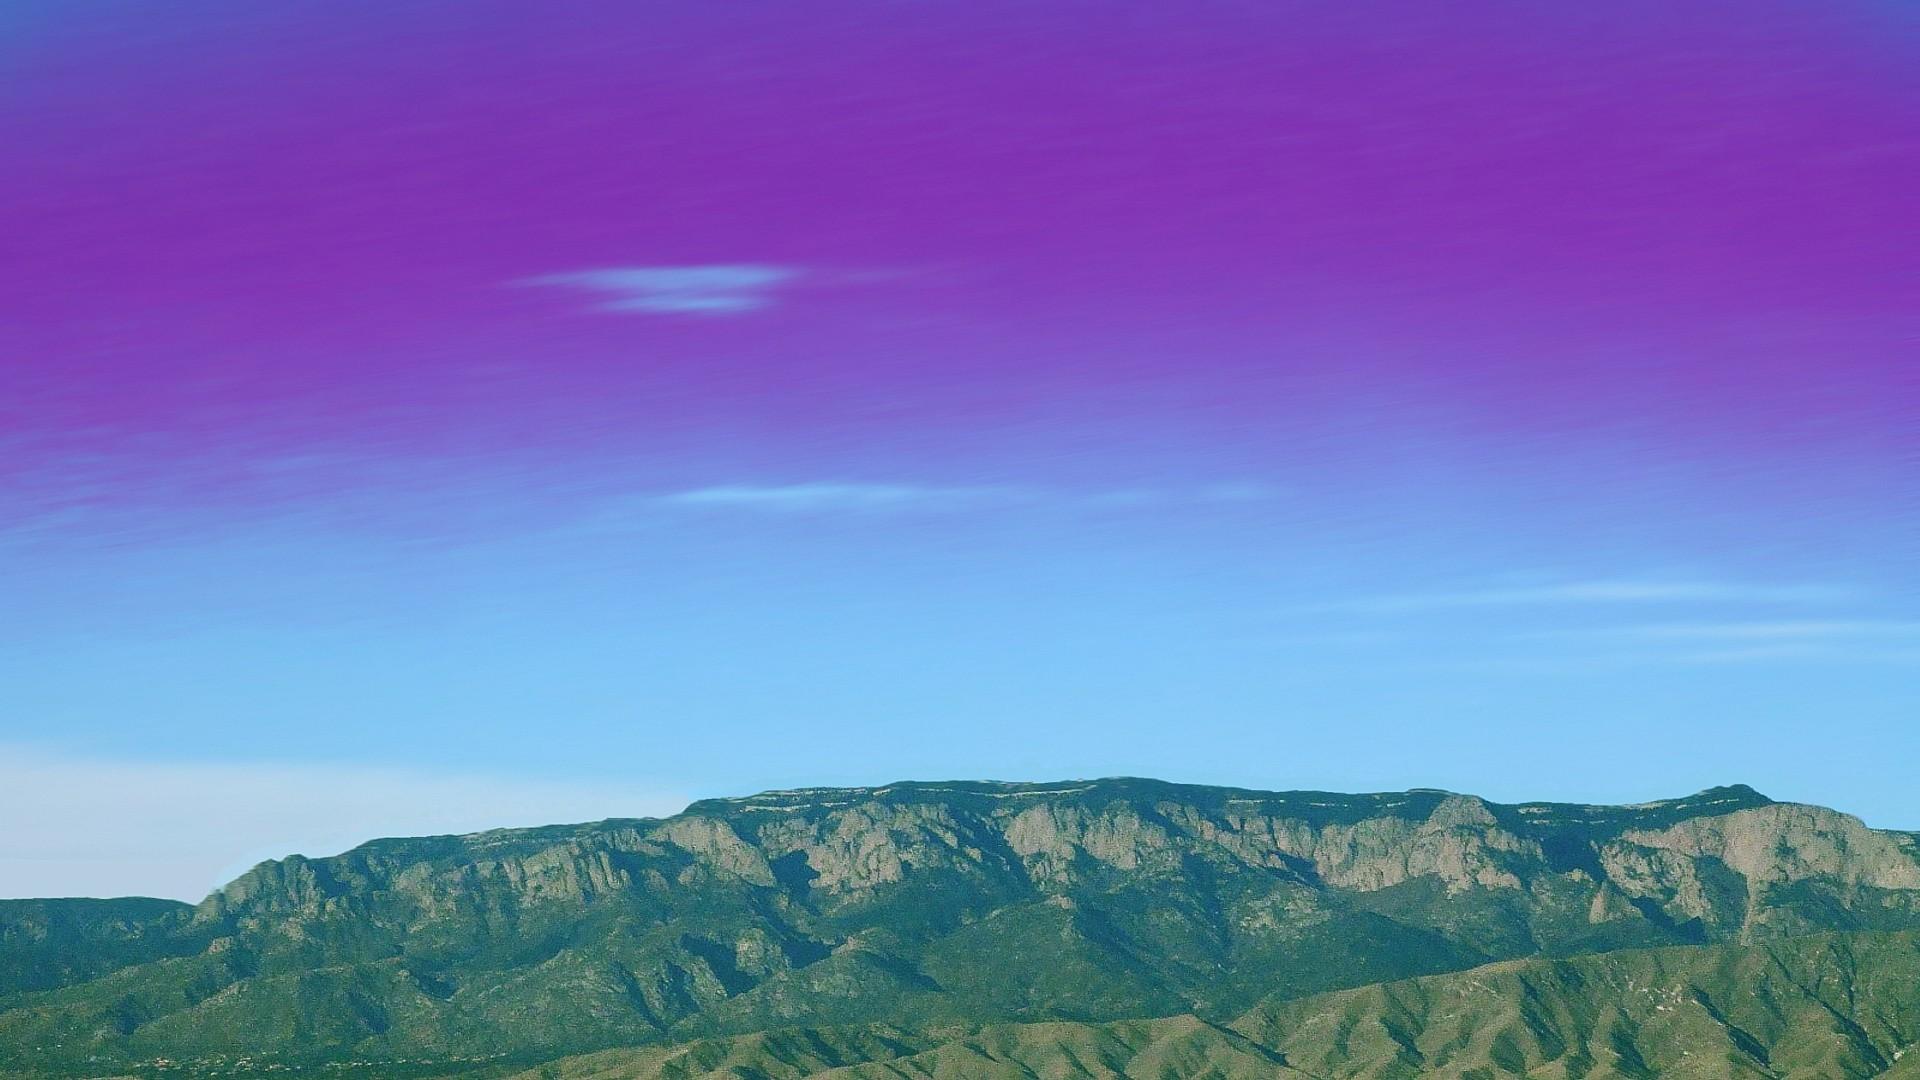 USA Wallpaper New Mexico HD Widescreen WallPaper for your Desktop 1920x1080